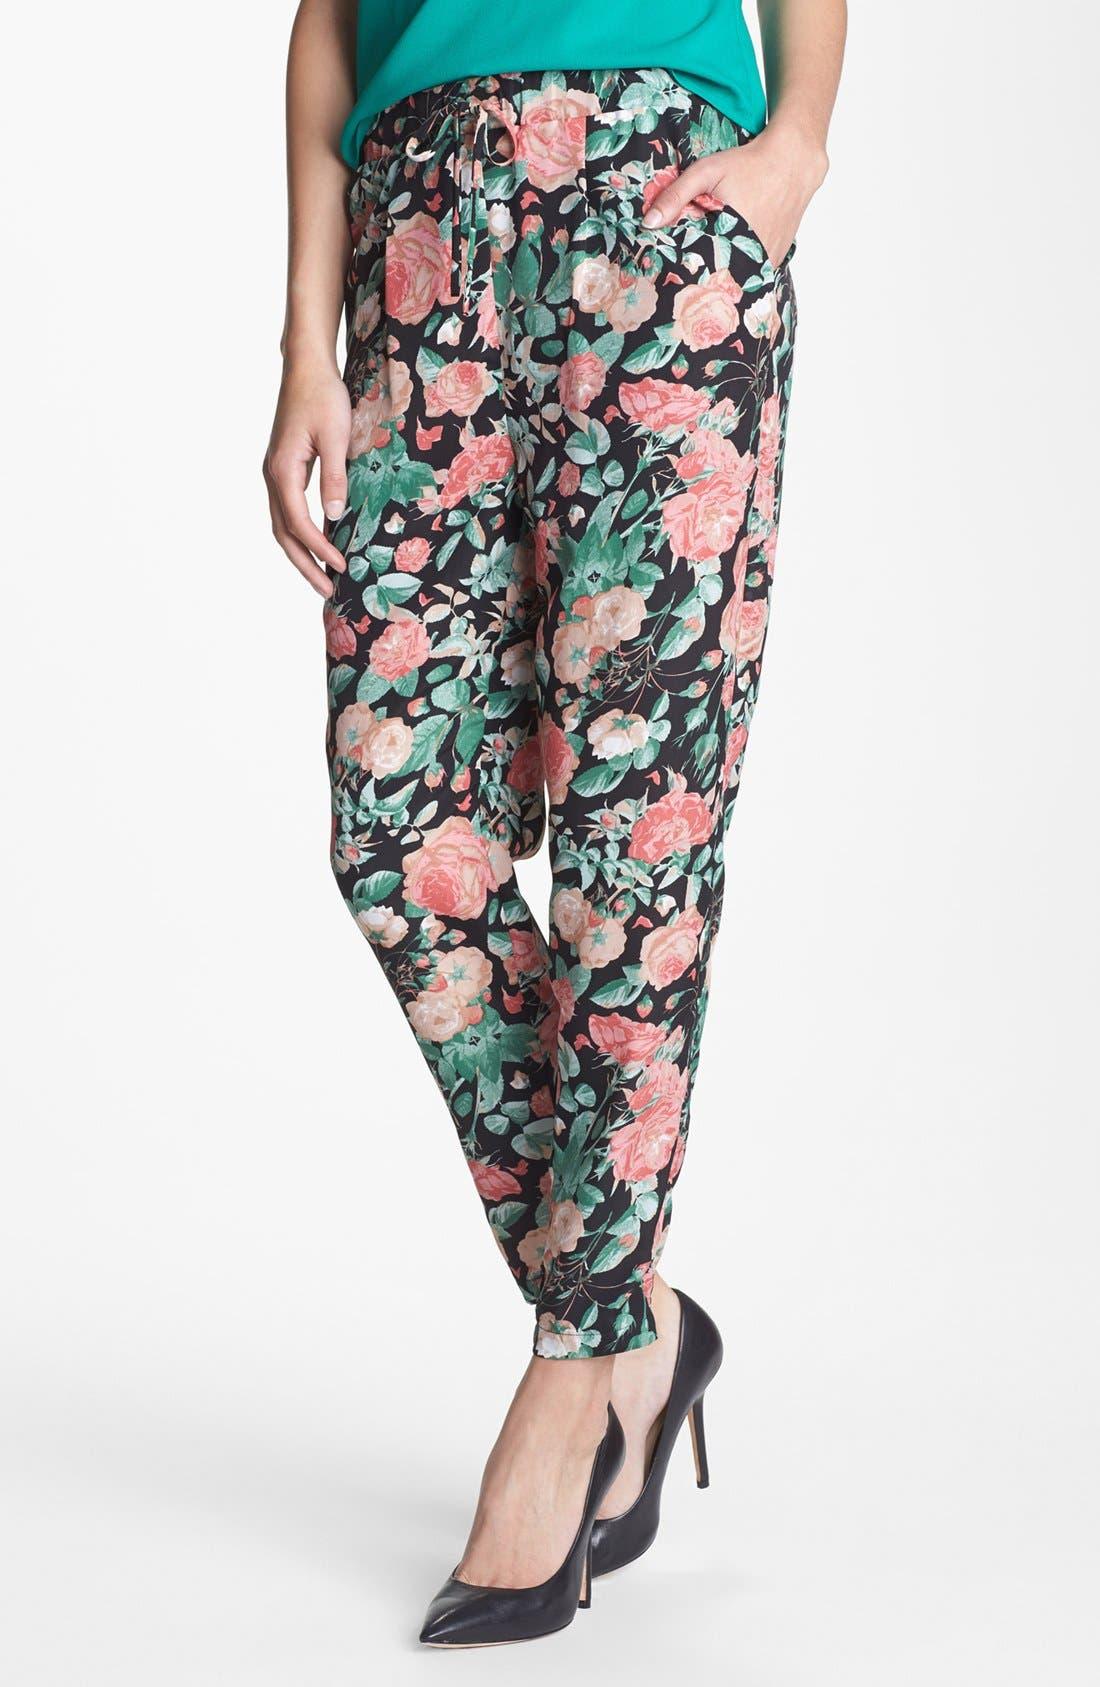 Alternate Image 1 Selected - Lovers + Friends 'Bright Eyes' Floral Print Pants